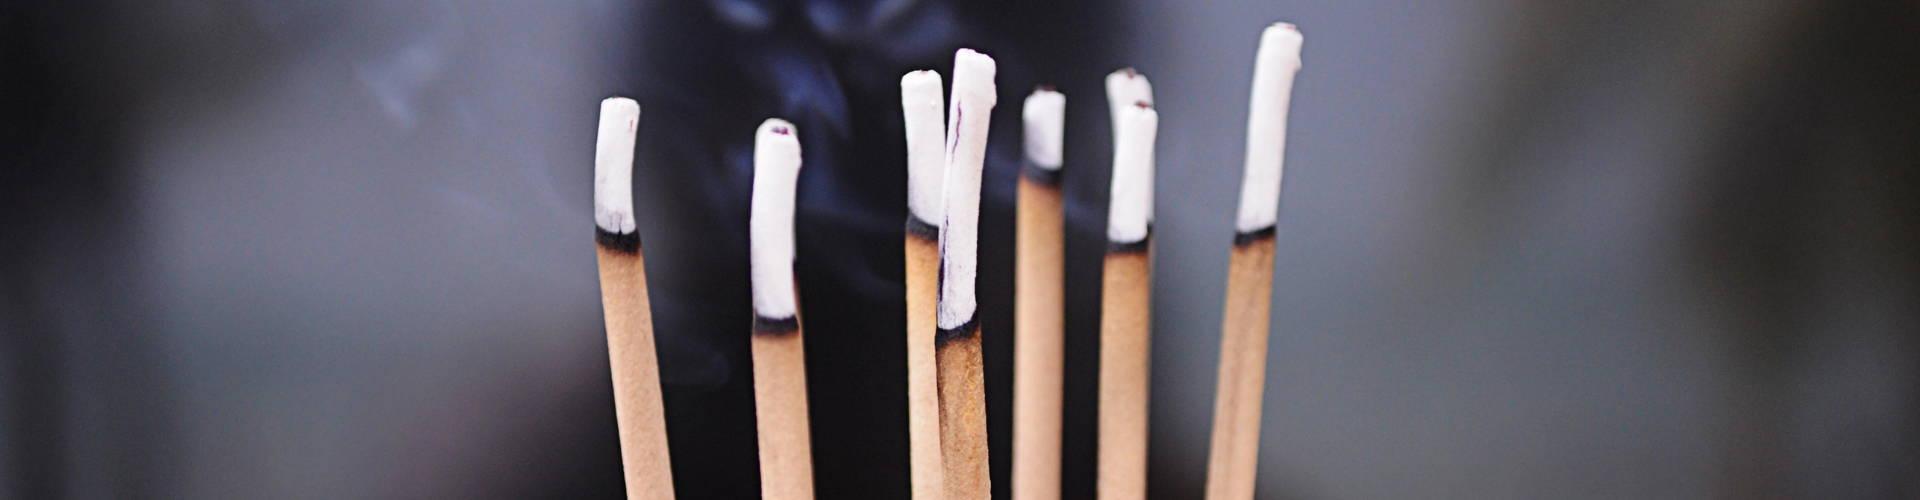 spiritual incense